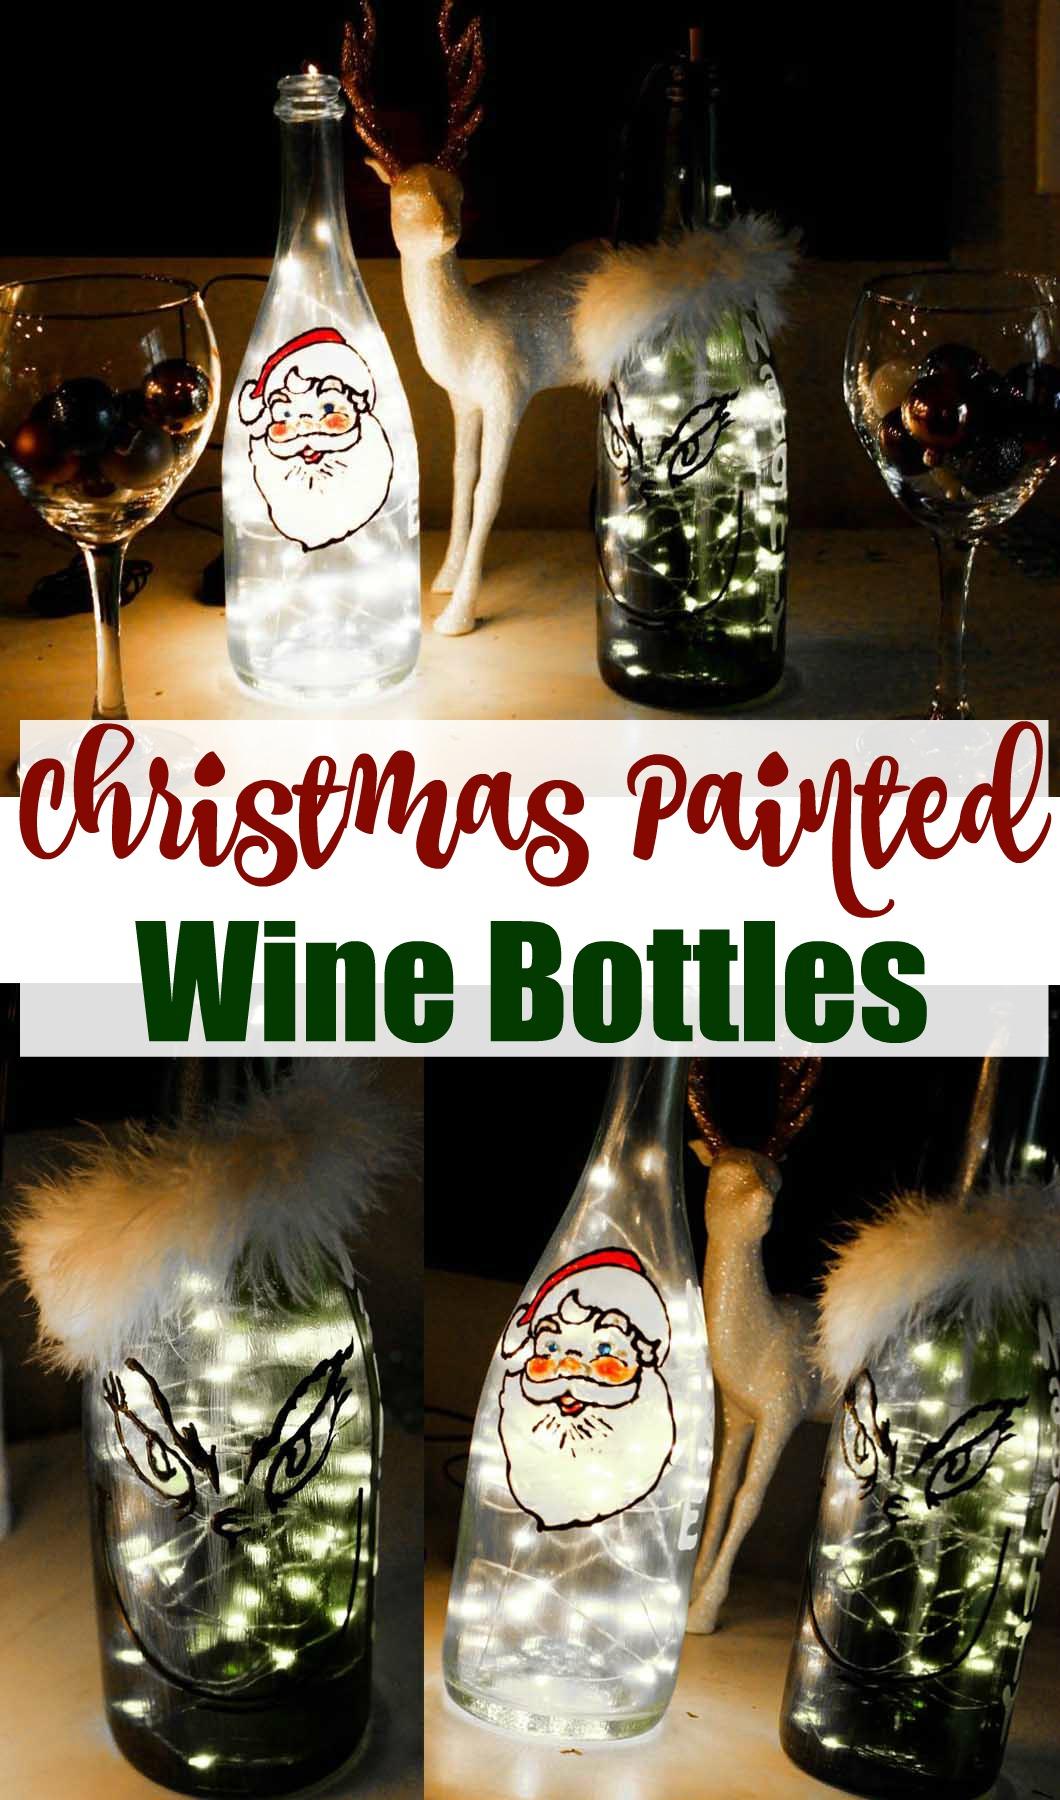 Christmas Painted Wine Bottles